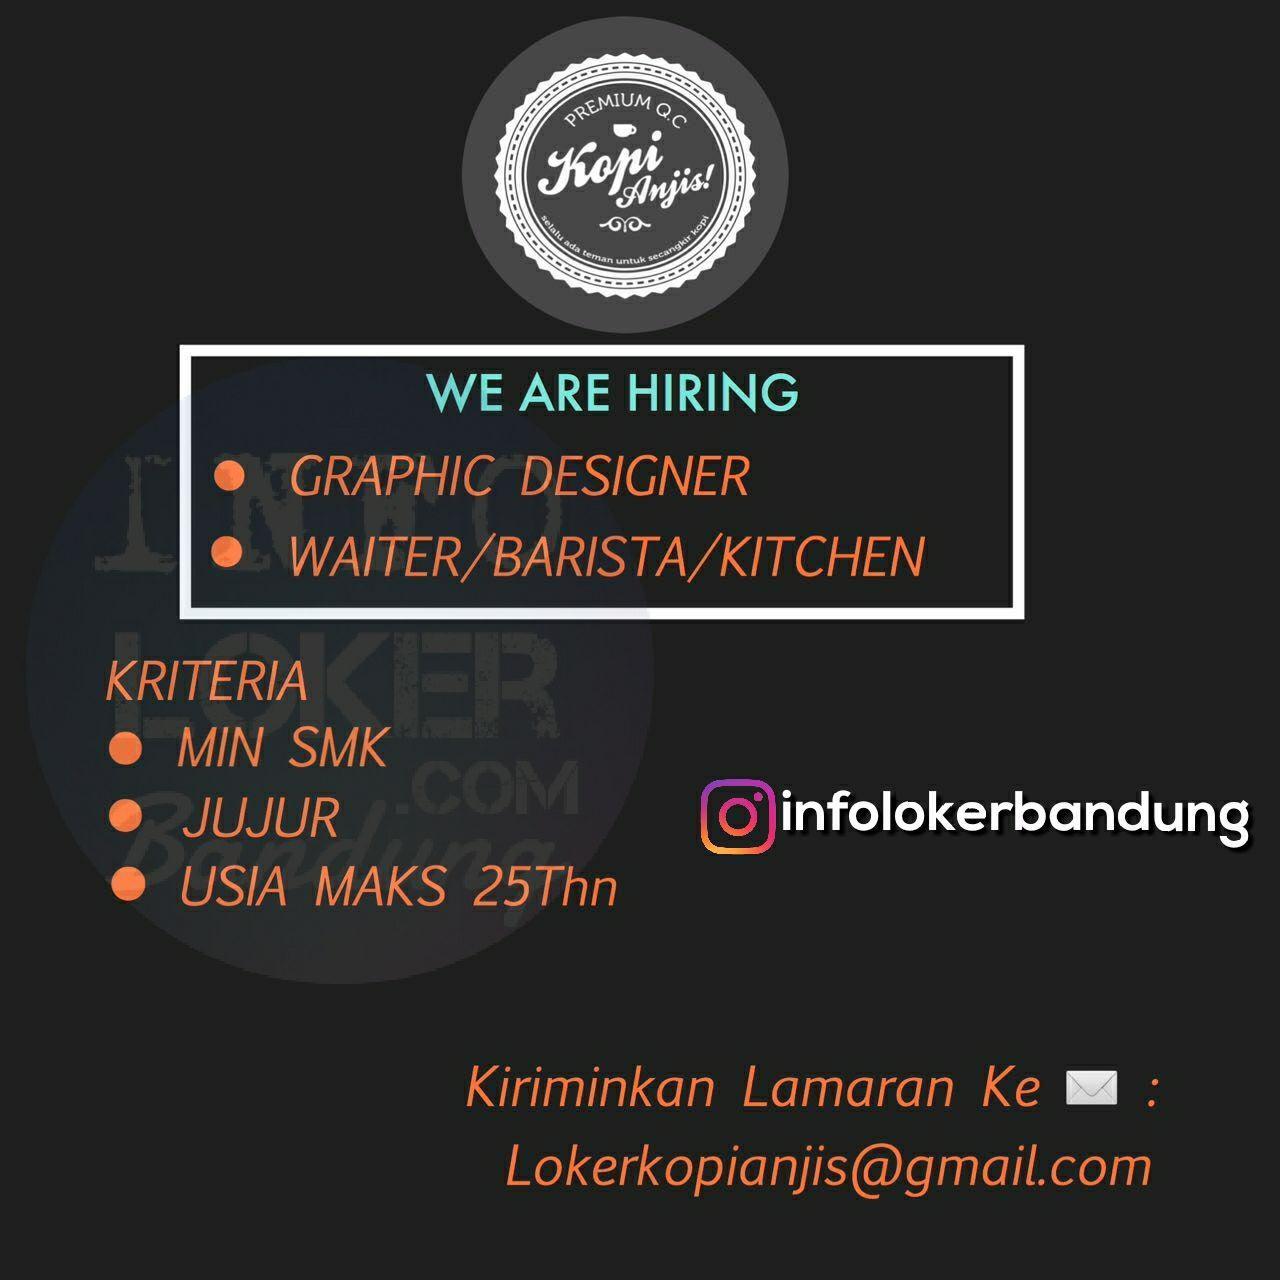 Lowongan Kerja Kopi Anjis Bandung Tahap II  November 2017